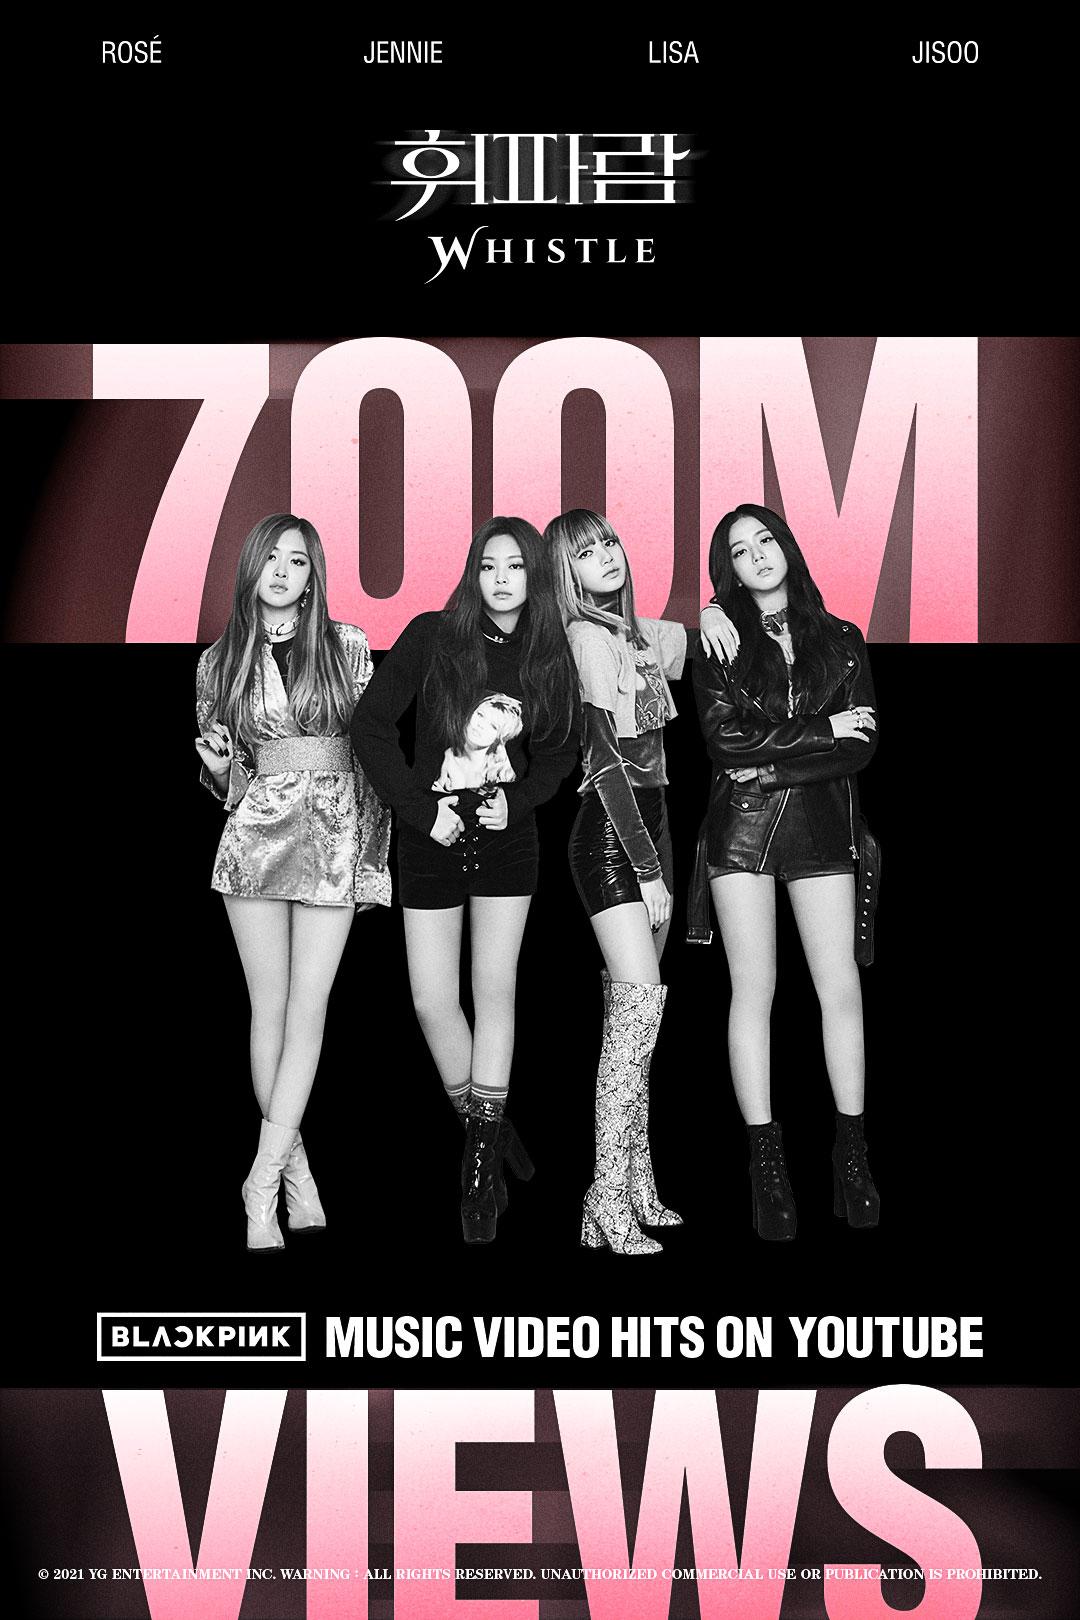 BLACKPINK Hits 700M on YouTube